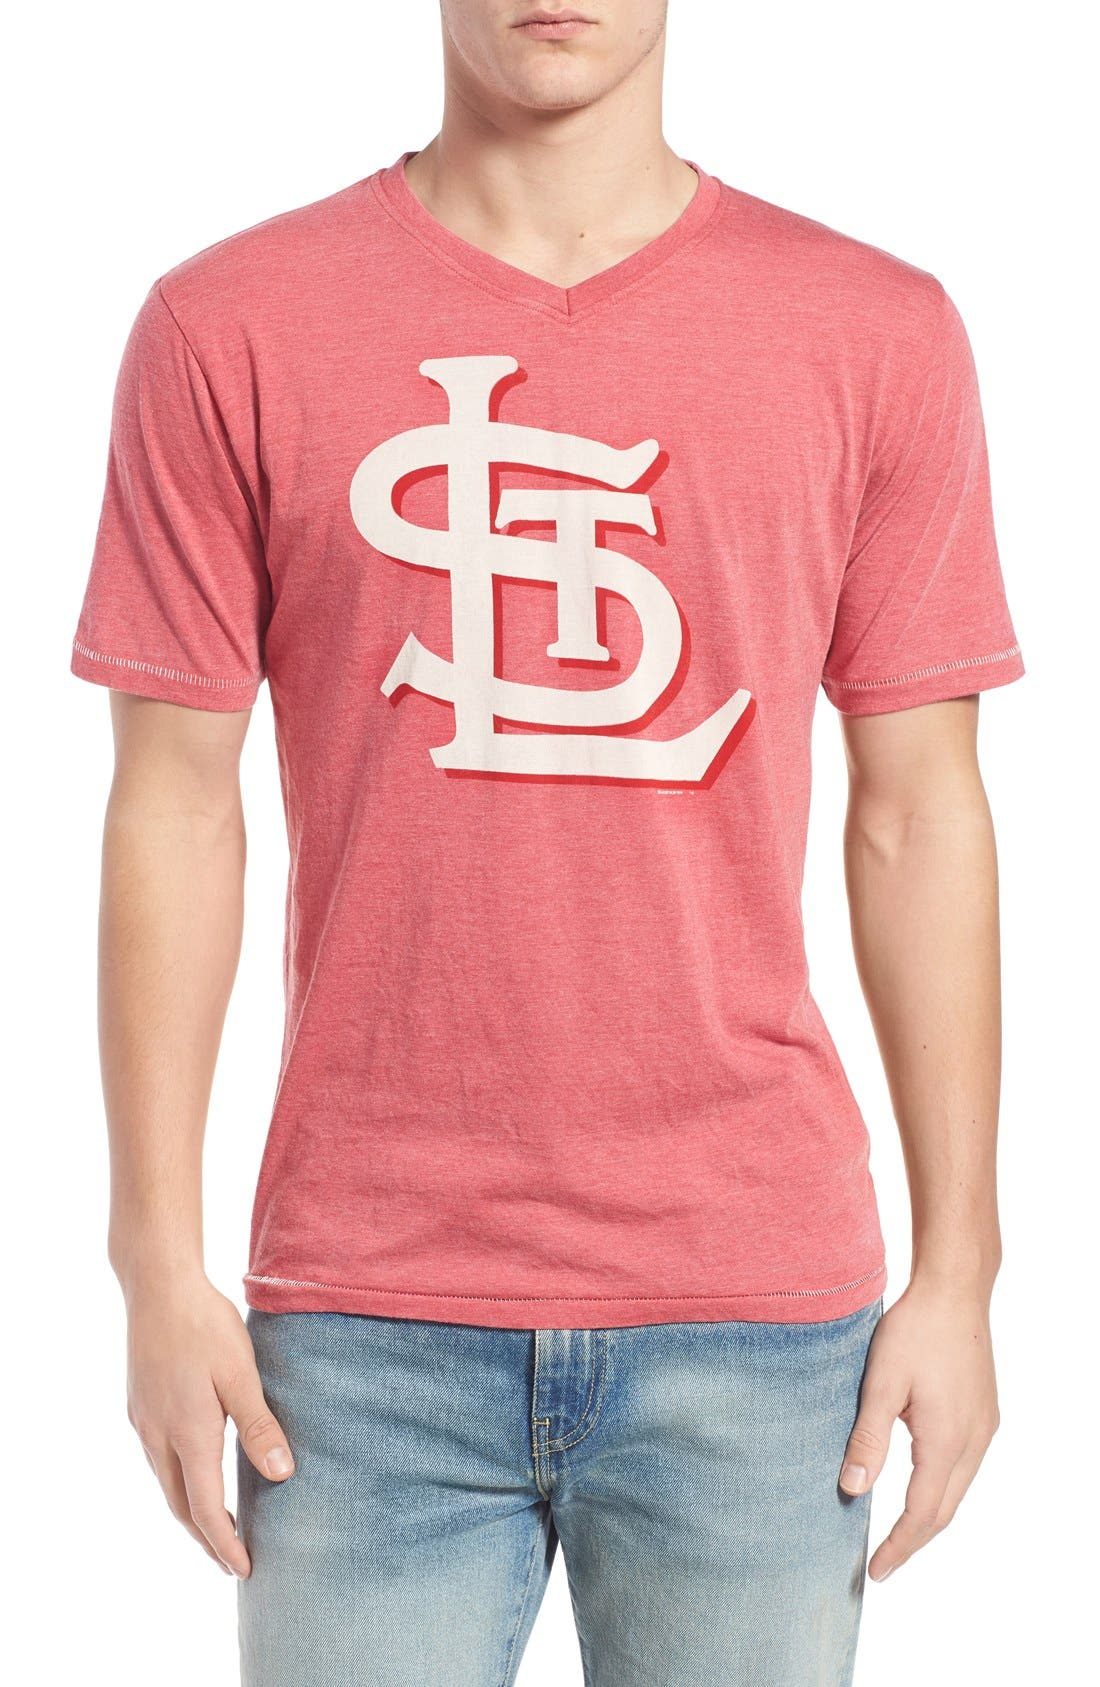 Red Jacket 'Saint Louis Cardinals - Calumet' Graphic V-Neck T-Shirt